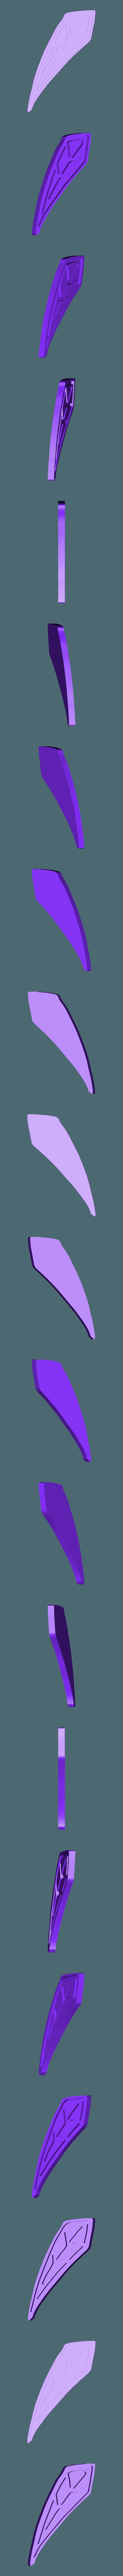 Leaf3.1_Red.stl Download free STL file Chicago Blackhawks Phone Stand • 3D printable template, stensethjeremy